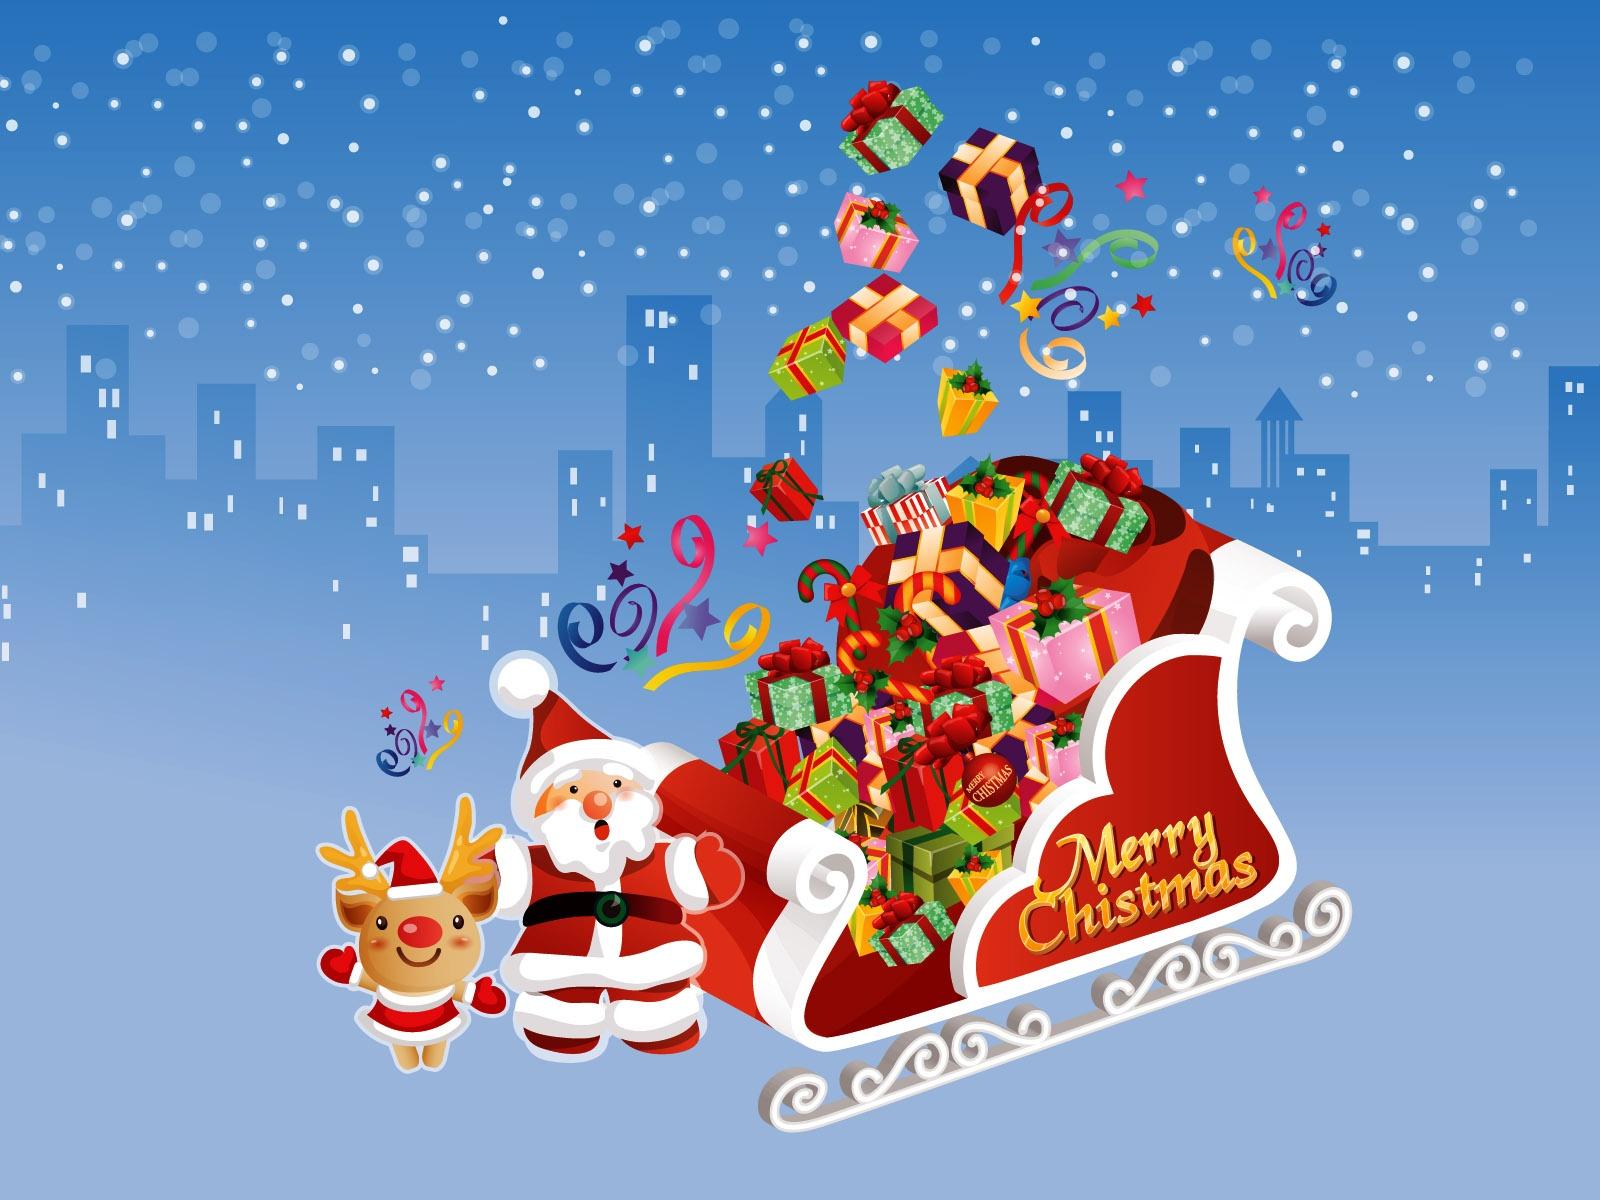 merry-christmas-wallpapers_31727_1600x1200.jpg